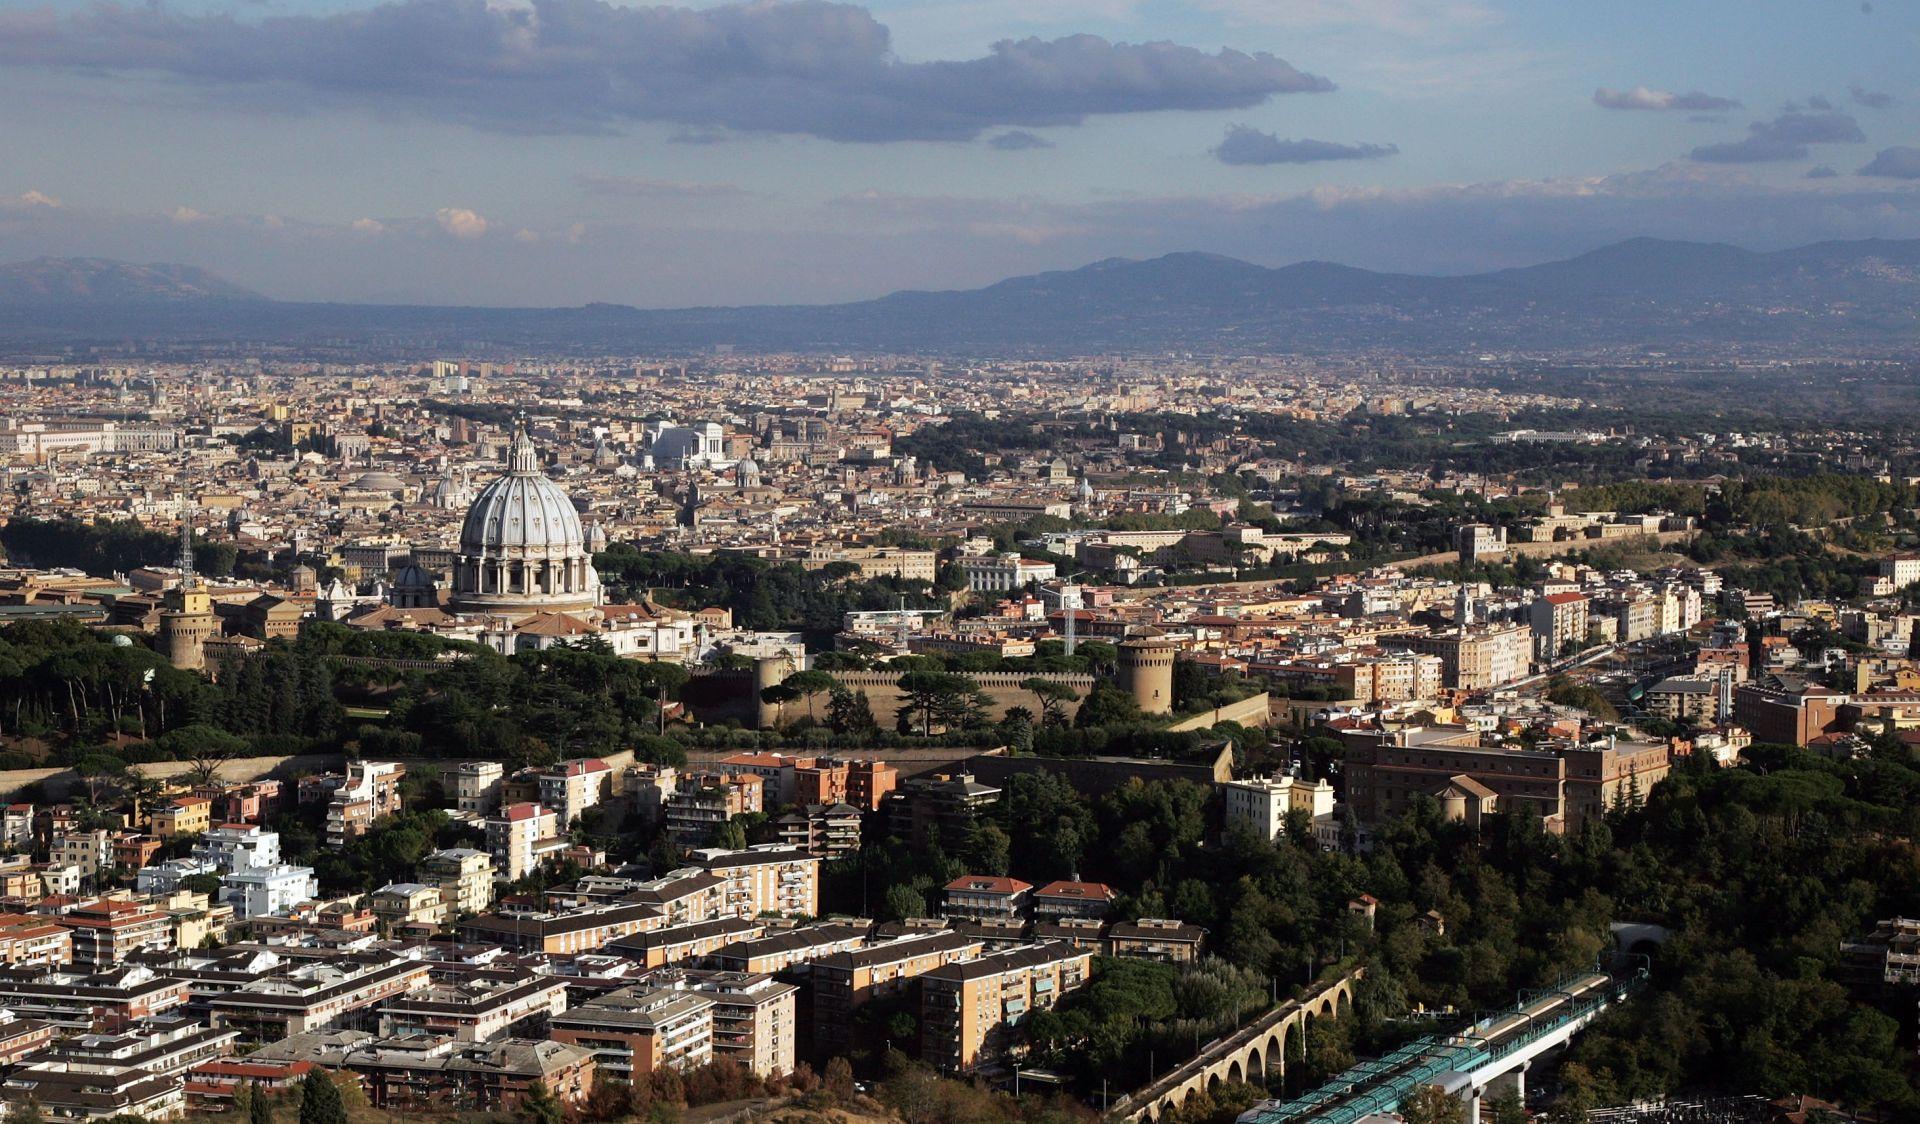 Gradonačelnik Rima: Konkretne opasnosti terorističkih napada